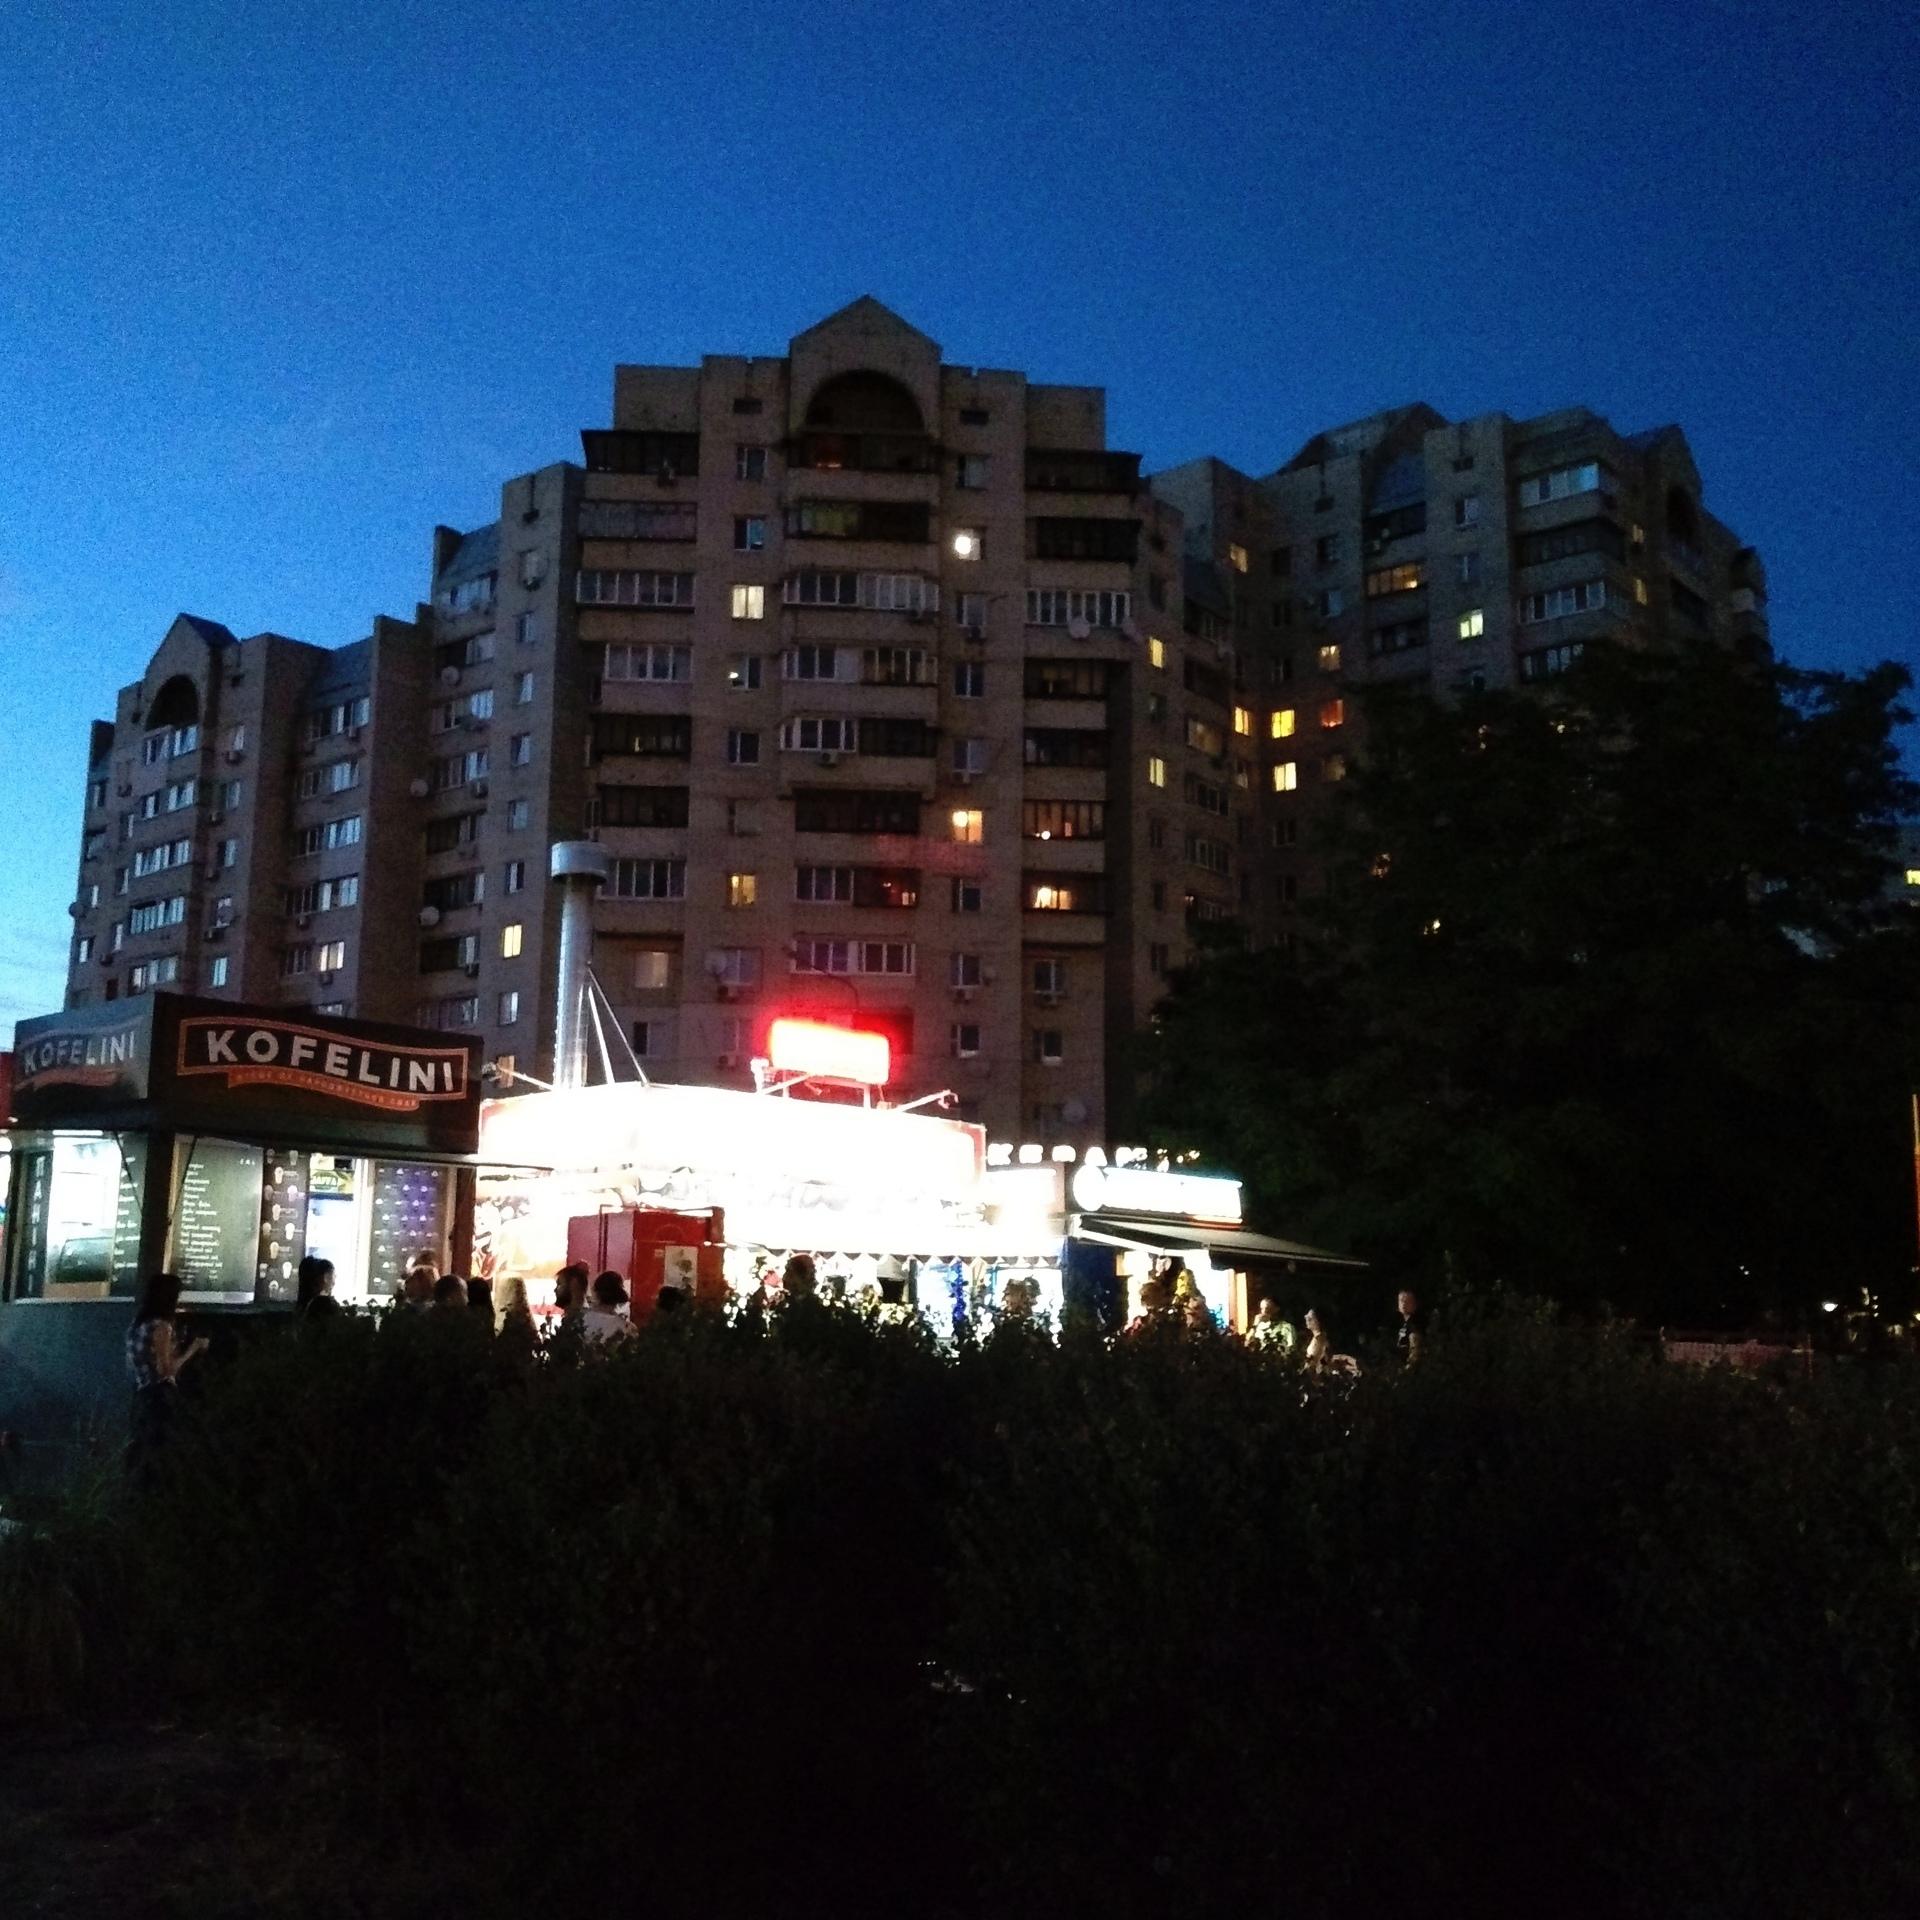 Елена Руденко (Валтея). Украина. Киев. Фото и описание.  3_Zd0jZmkLE